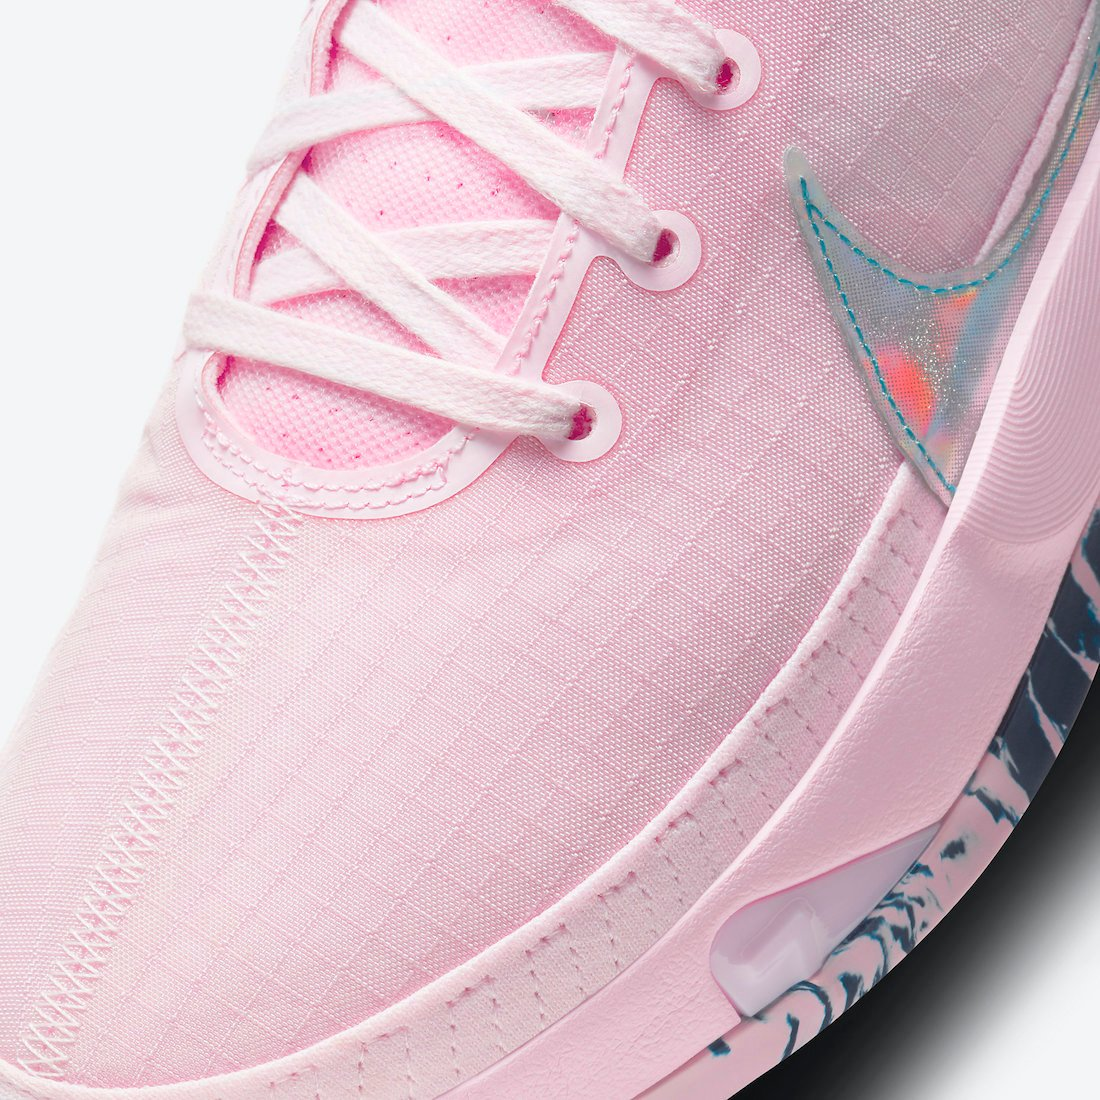 Nike KD 13 Aunt Pearl DC0011-600 Release Date Info